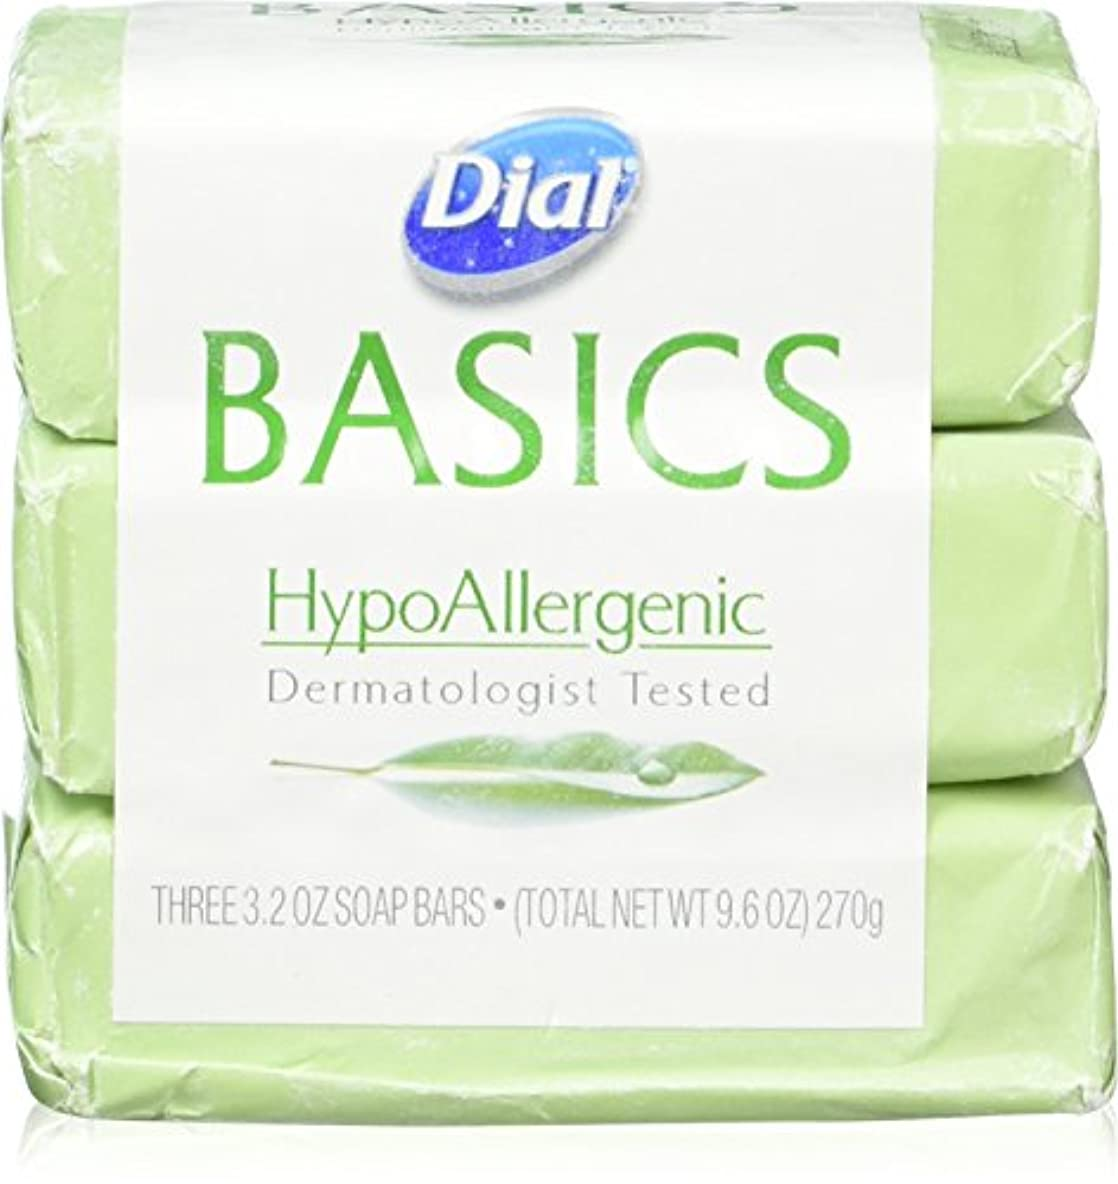 Dial Basics HypoAllergenic Dermatologist Tested Bar Soap, 3.2 oz (12 Bars) by Basics